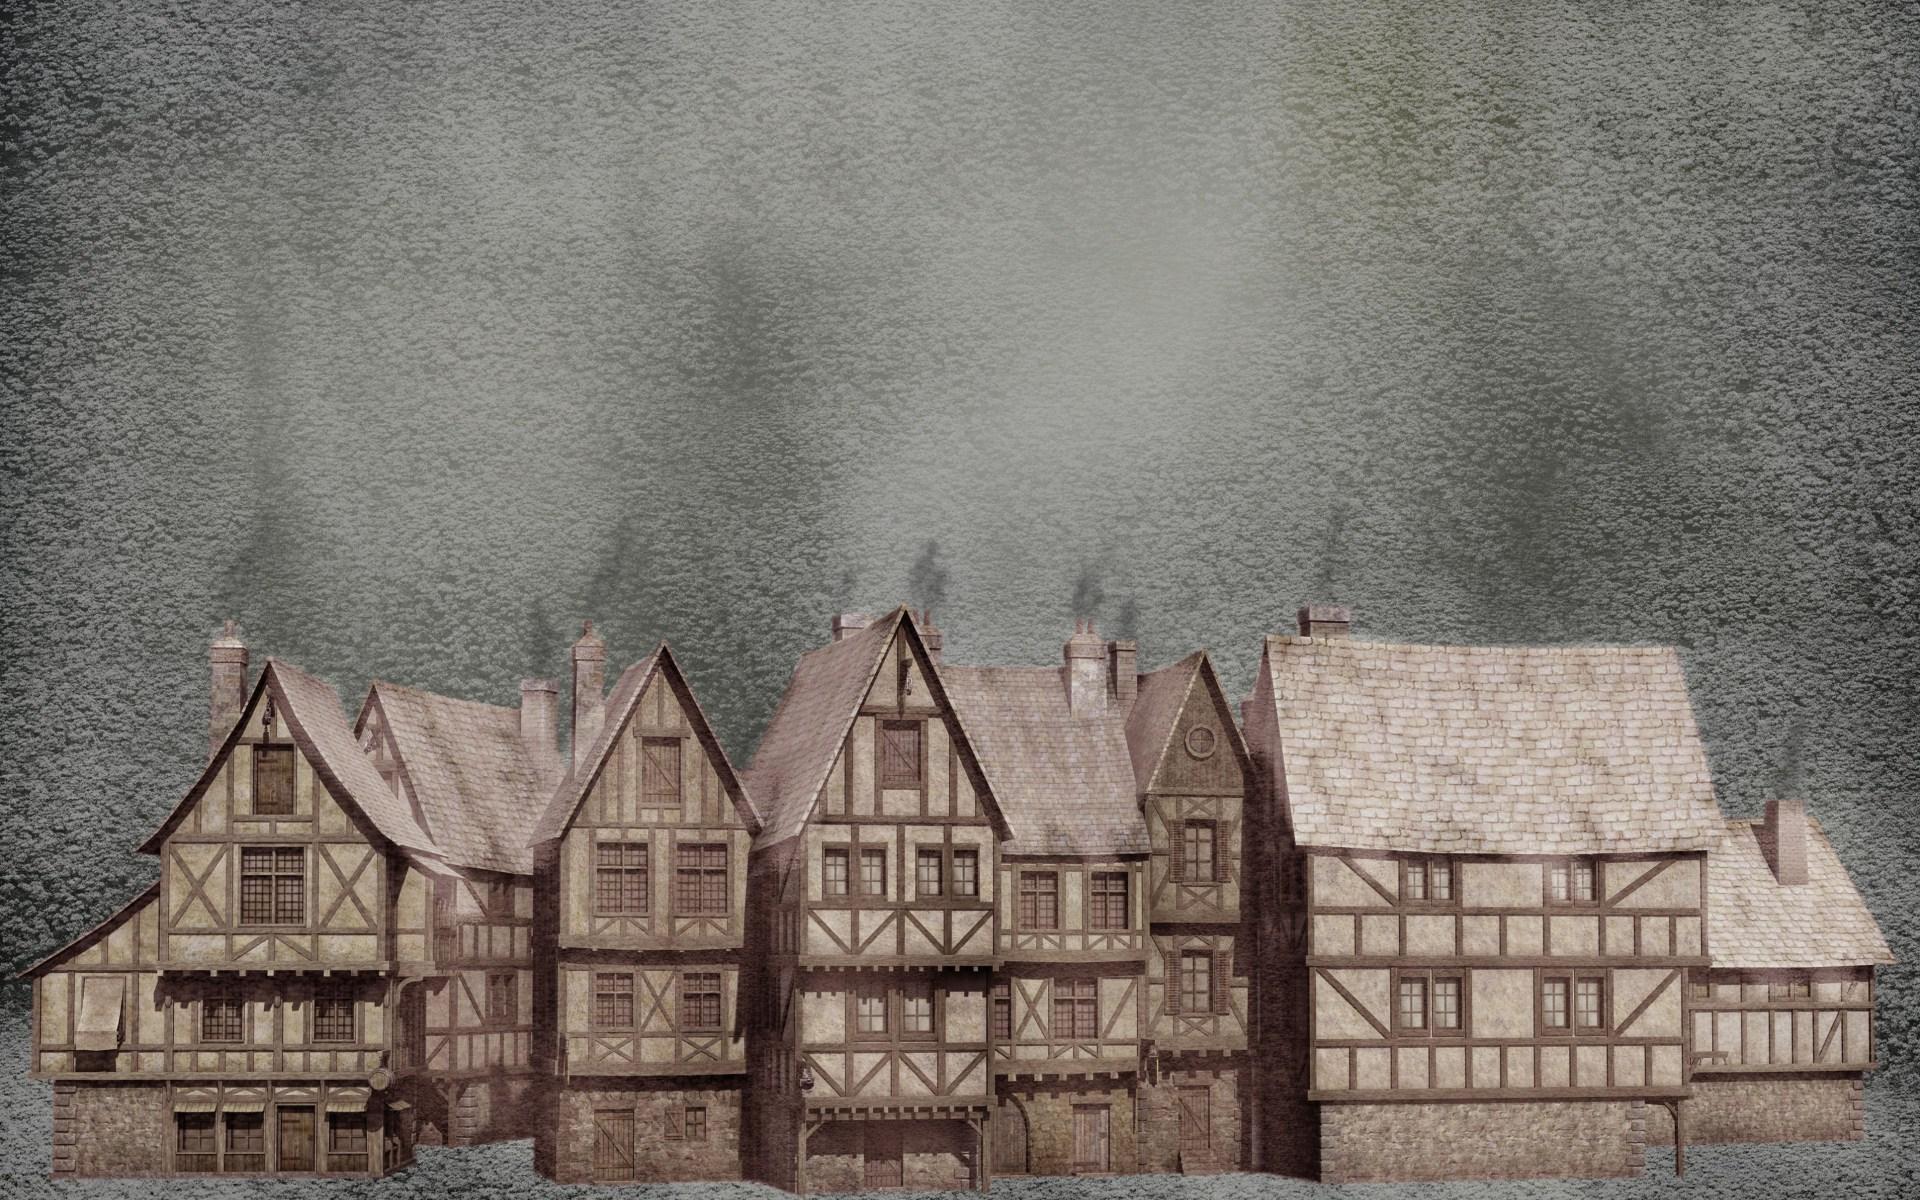 Oliver Twist Snow In The Old Town BestWallSitecom 1920x1200